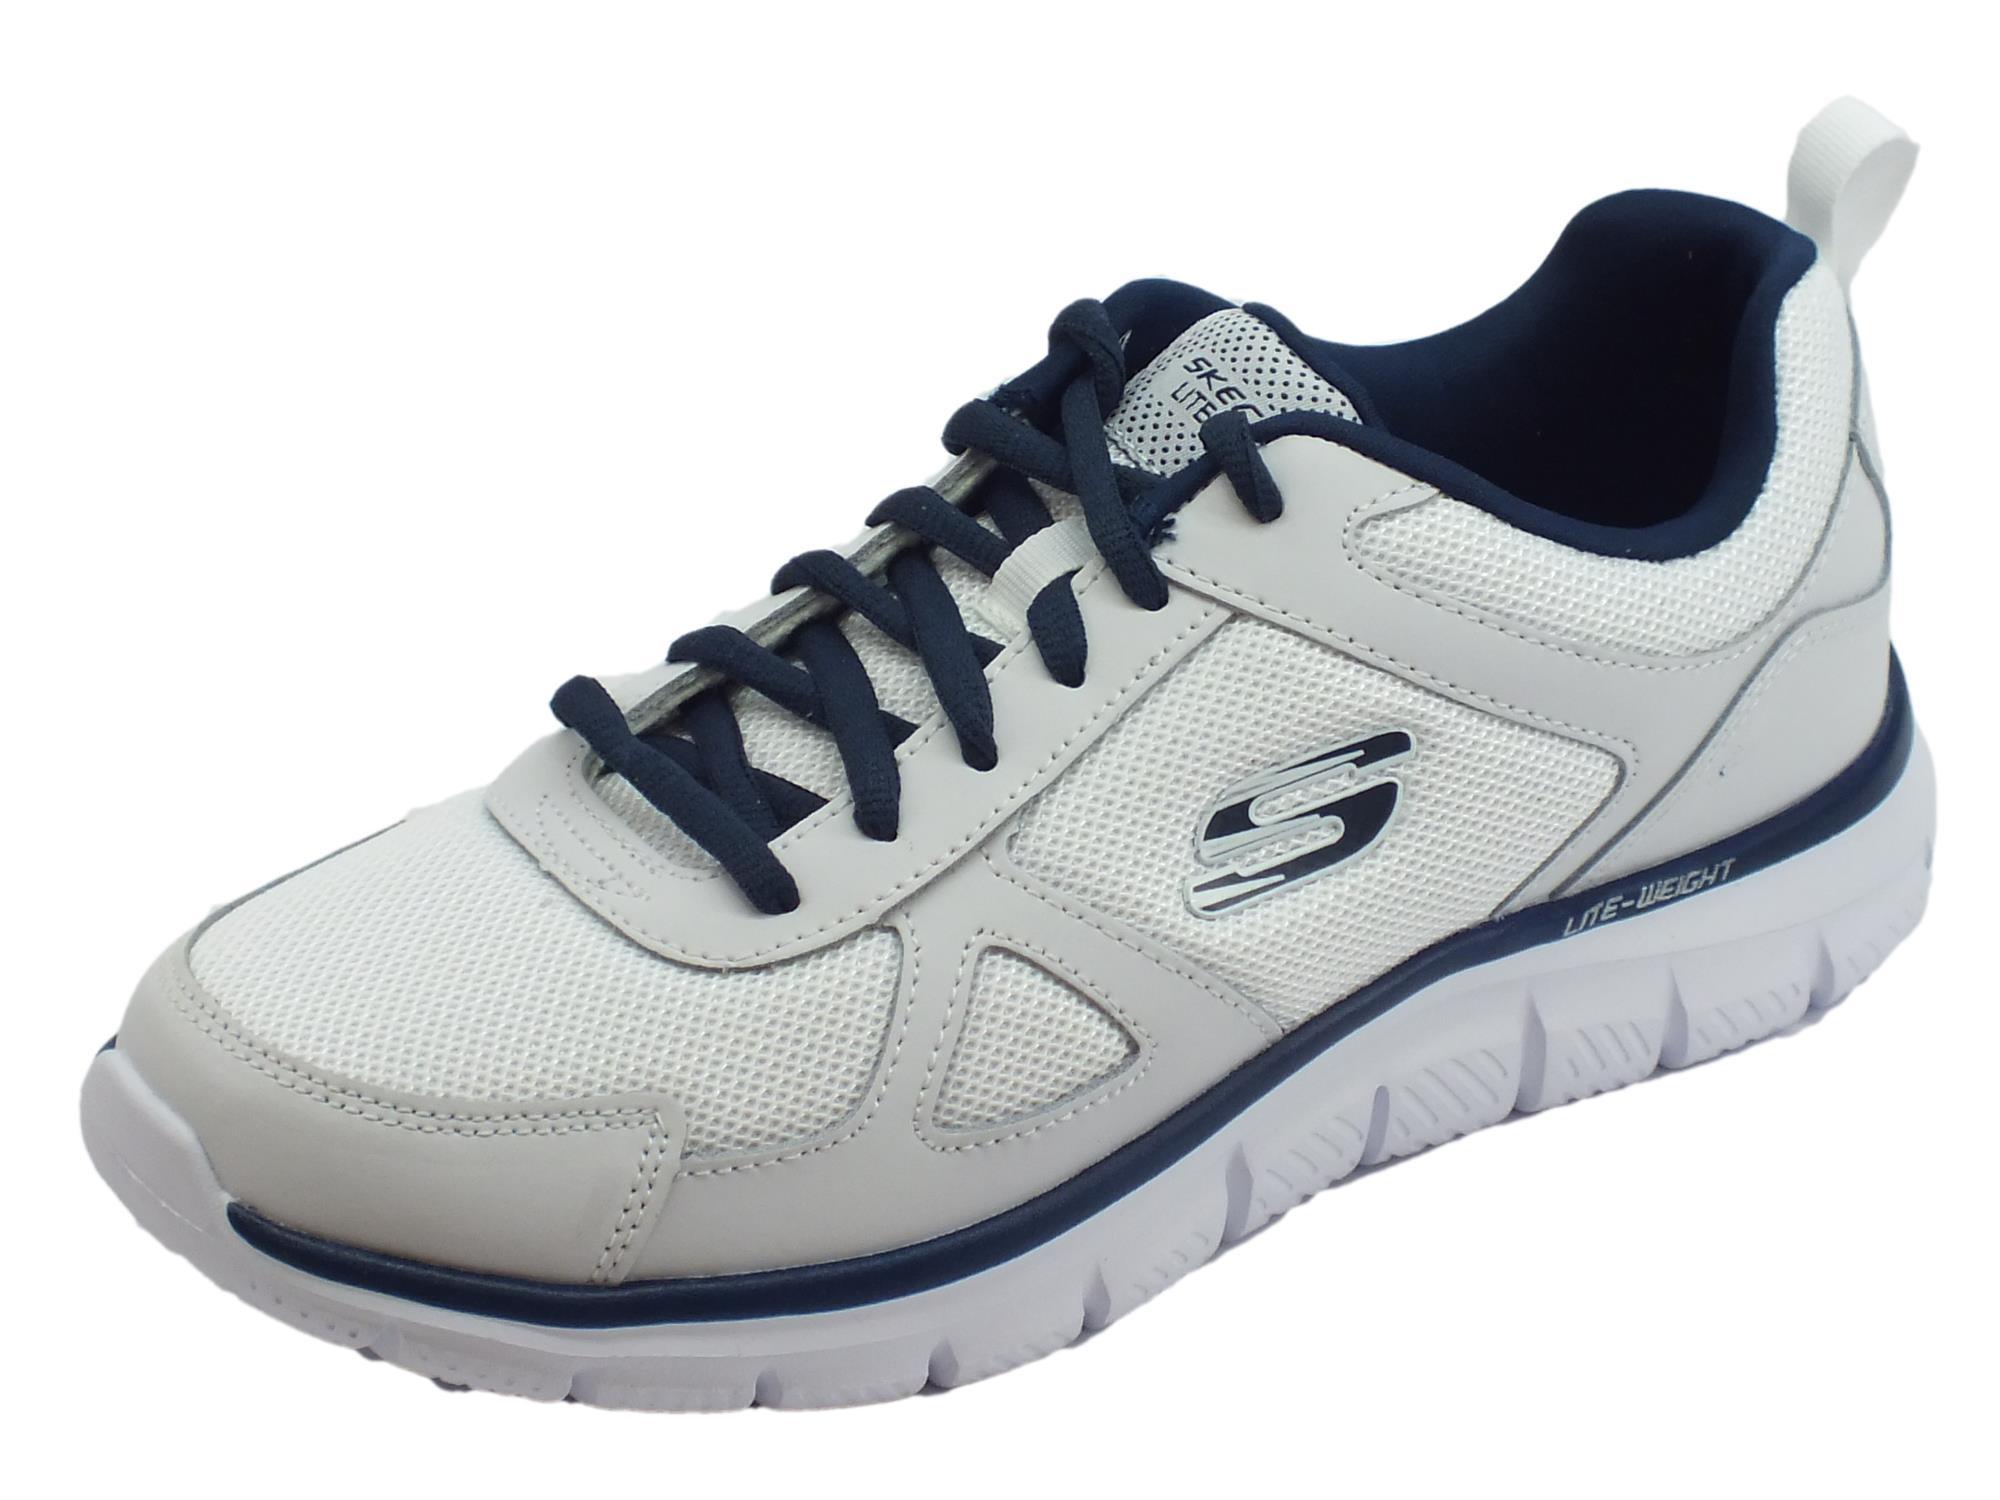 Skechers Sport Track Scloric scarpe sportive uomo in pelle e tessuto bianco  e blu 06f21f9721a